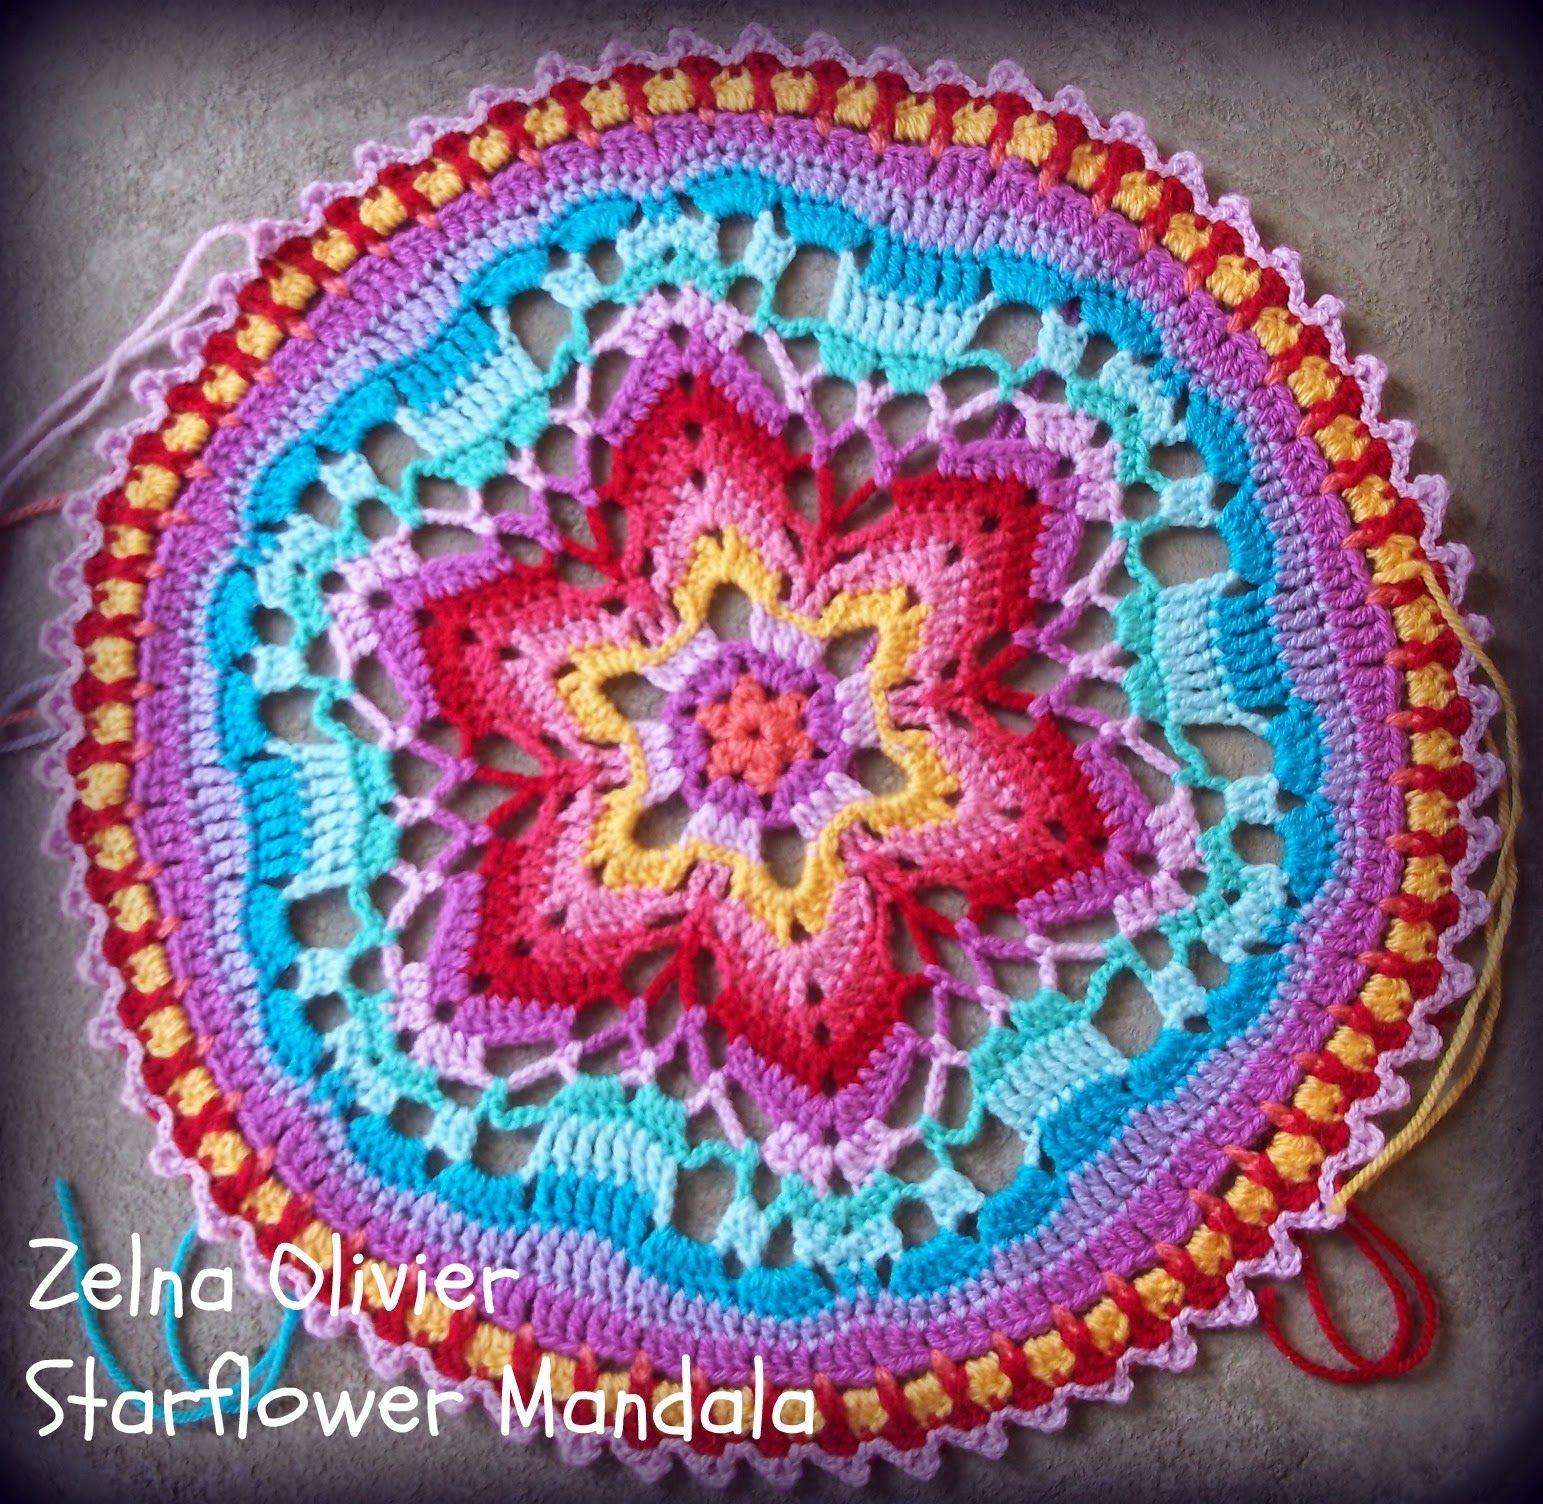 Pin Von Joyce Loves Crochet Auf Crochet Mandalas Pinterest